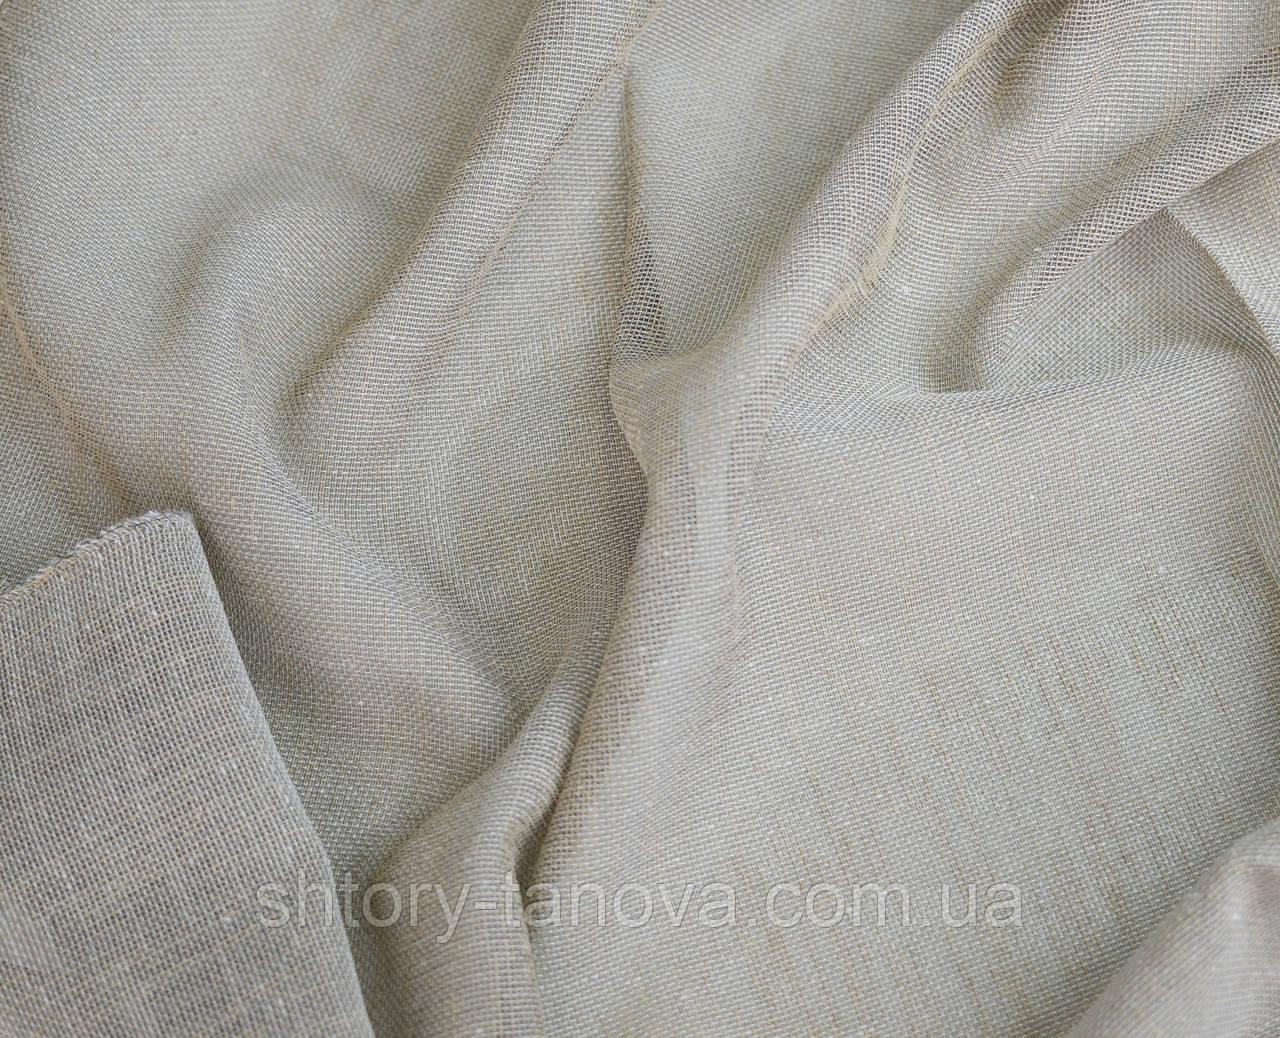 Ткань для тюля натуральная Alacati 11